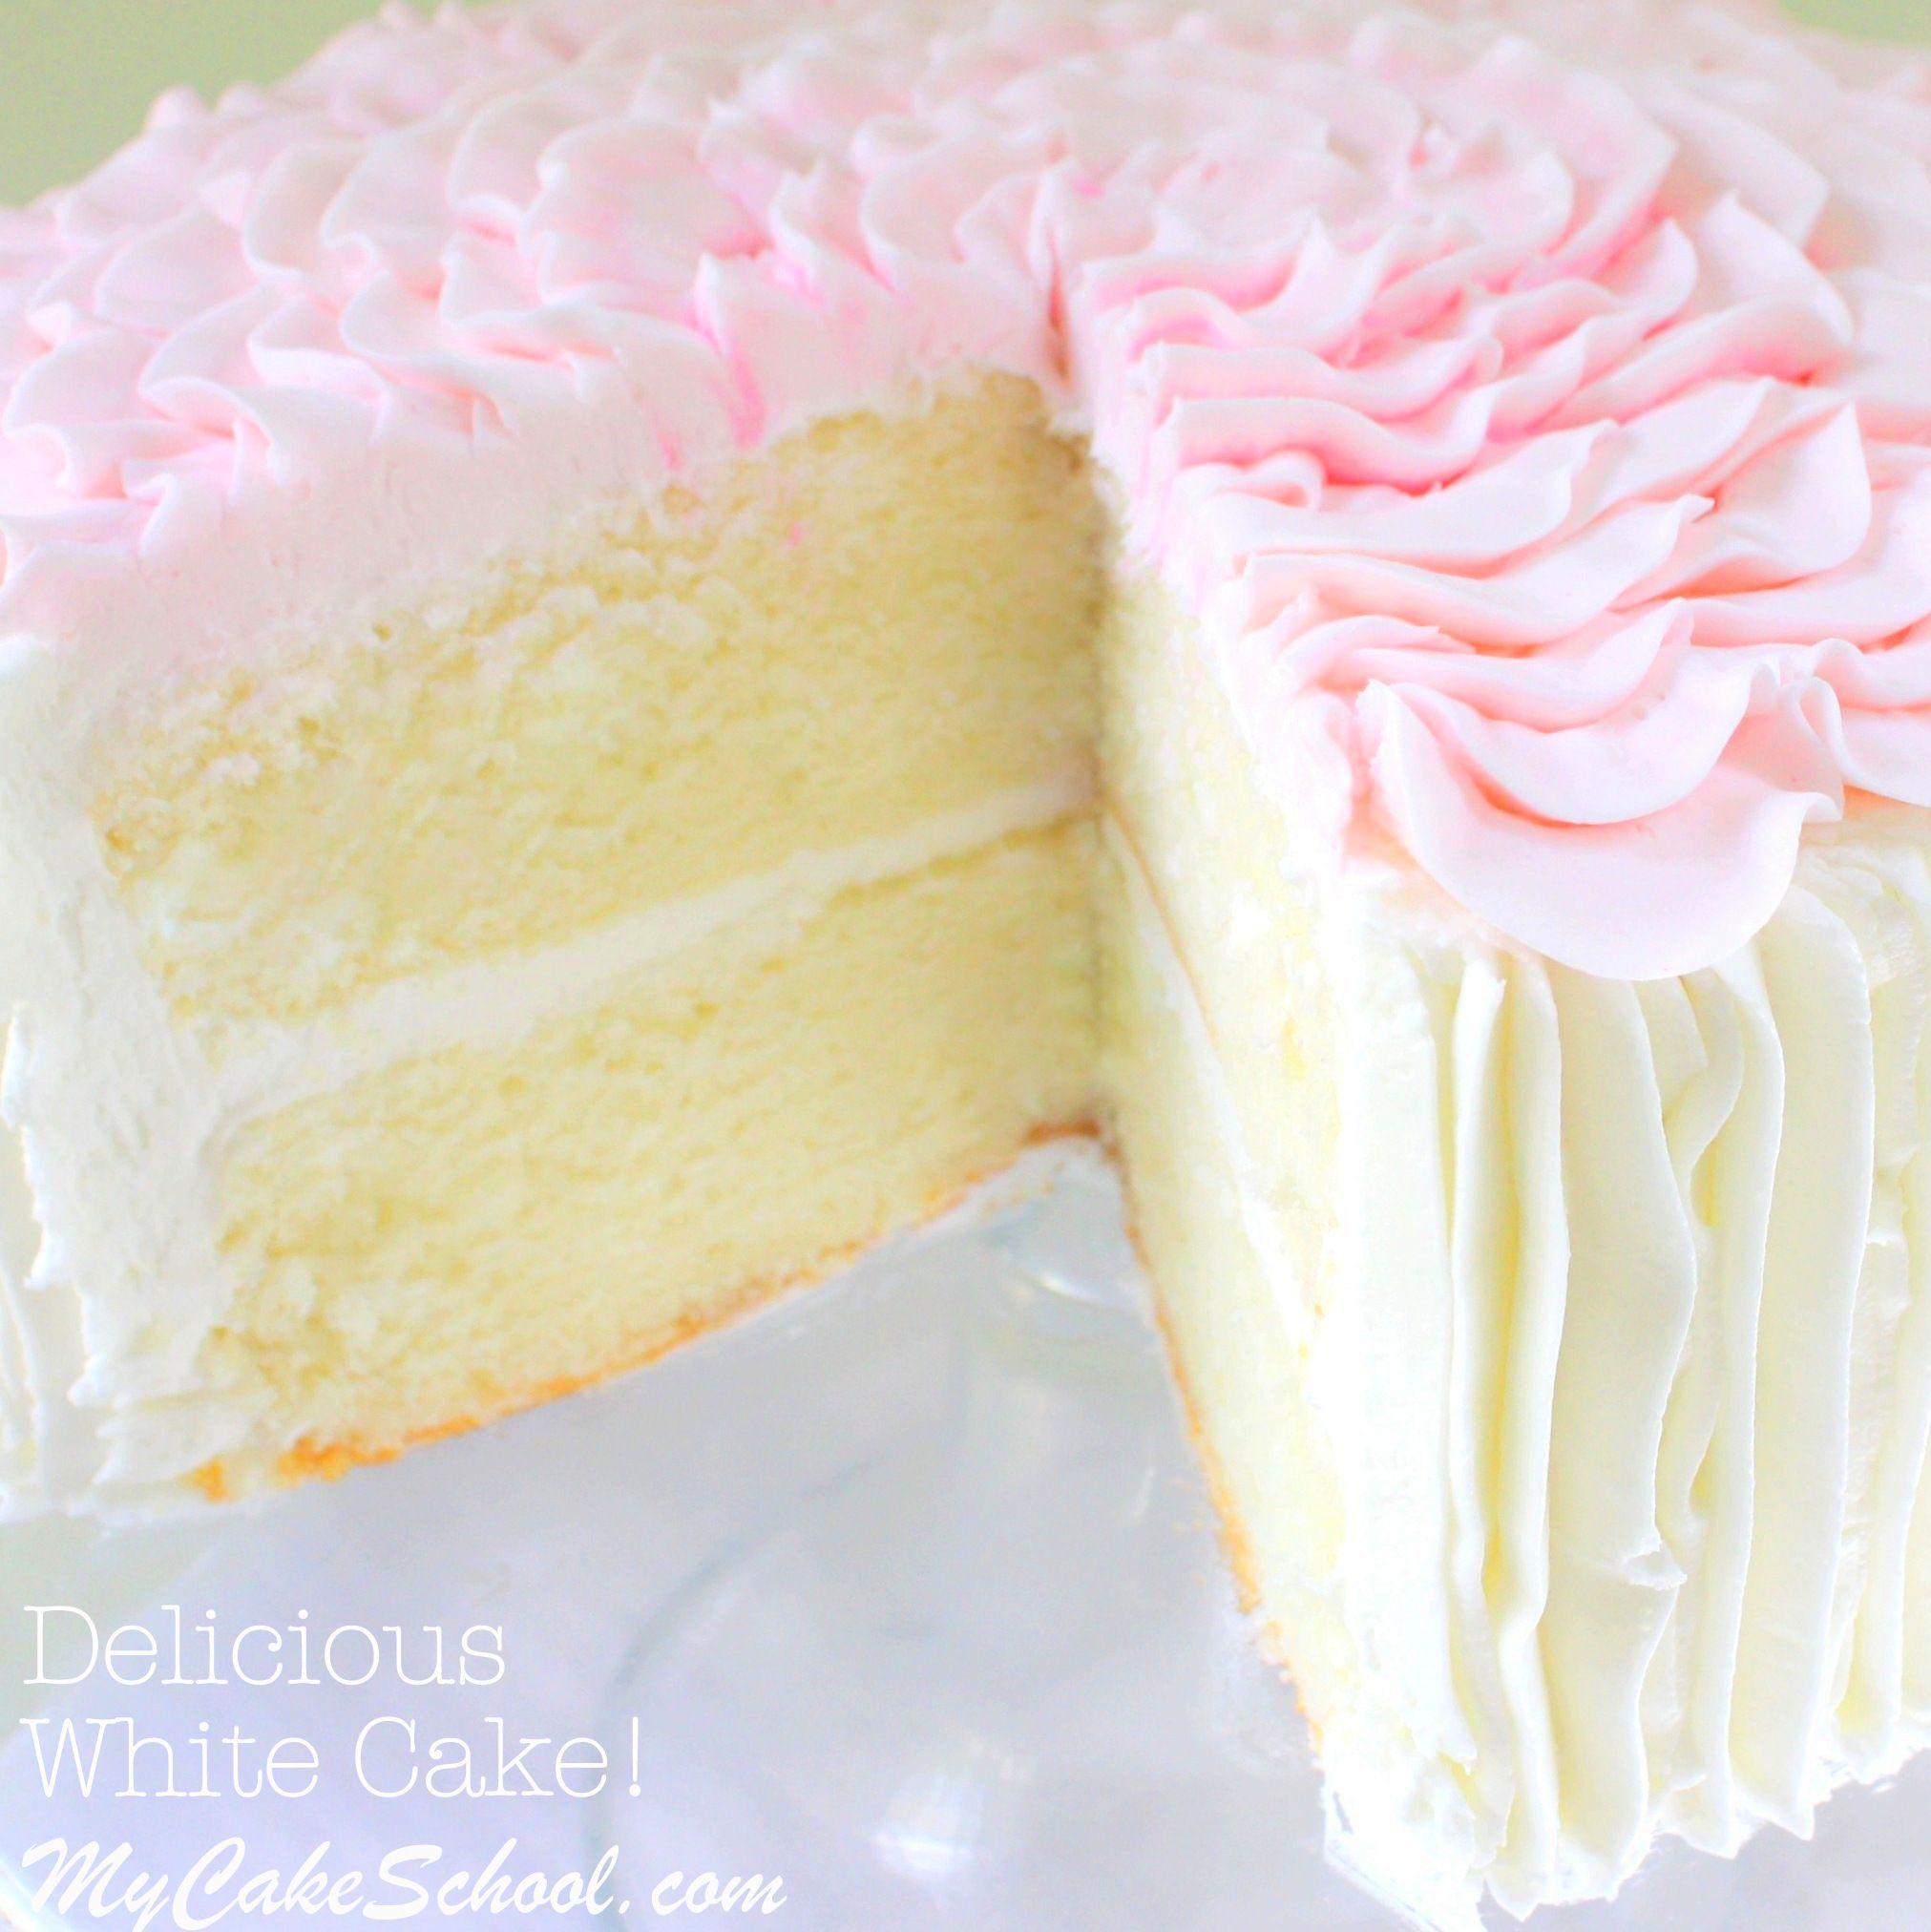 The Best White Cake From Scratch Recipe By Mycakeschool Online Tutorials